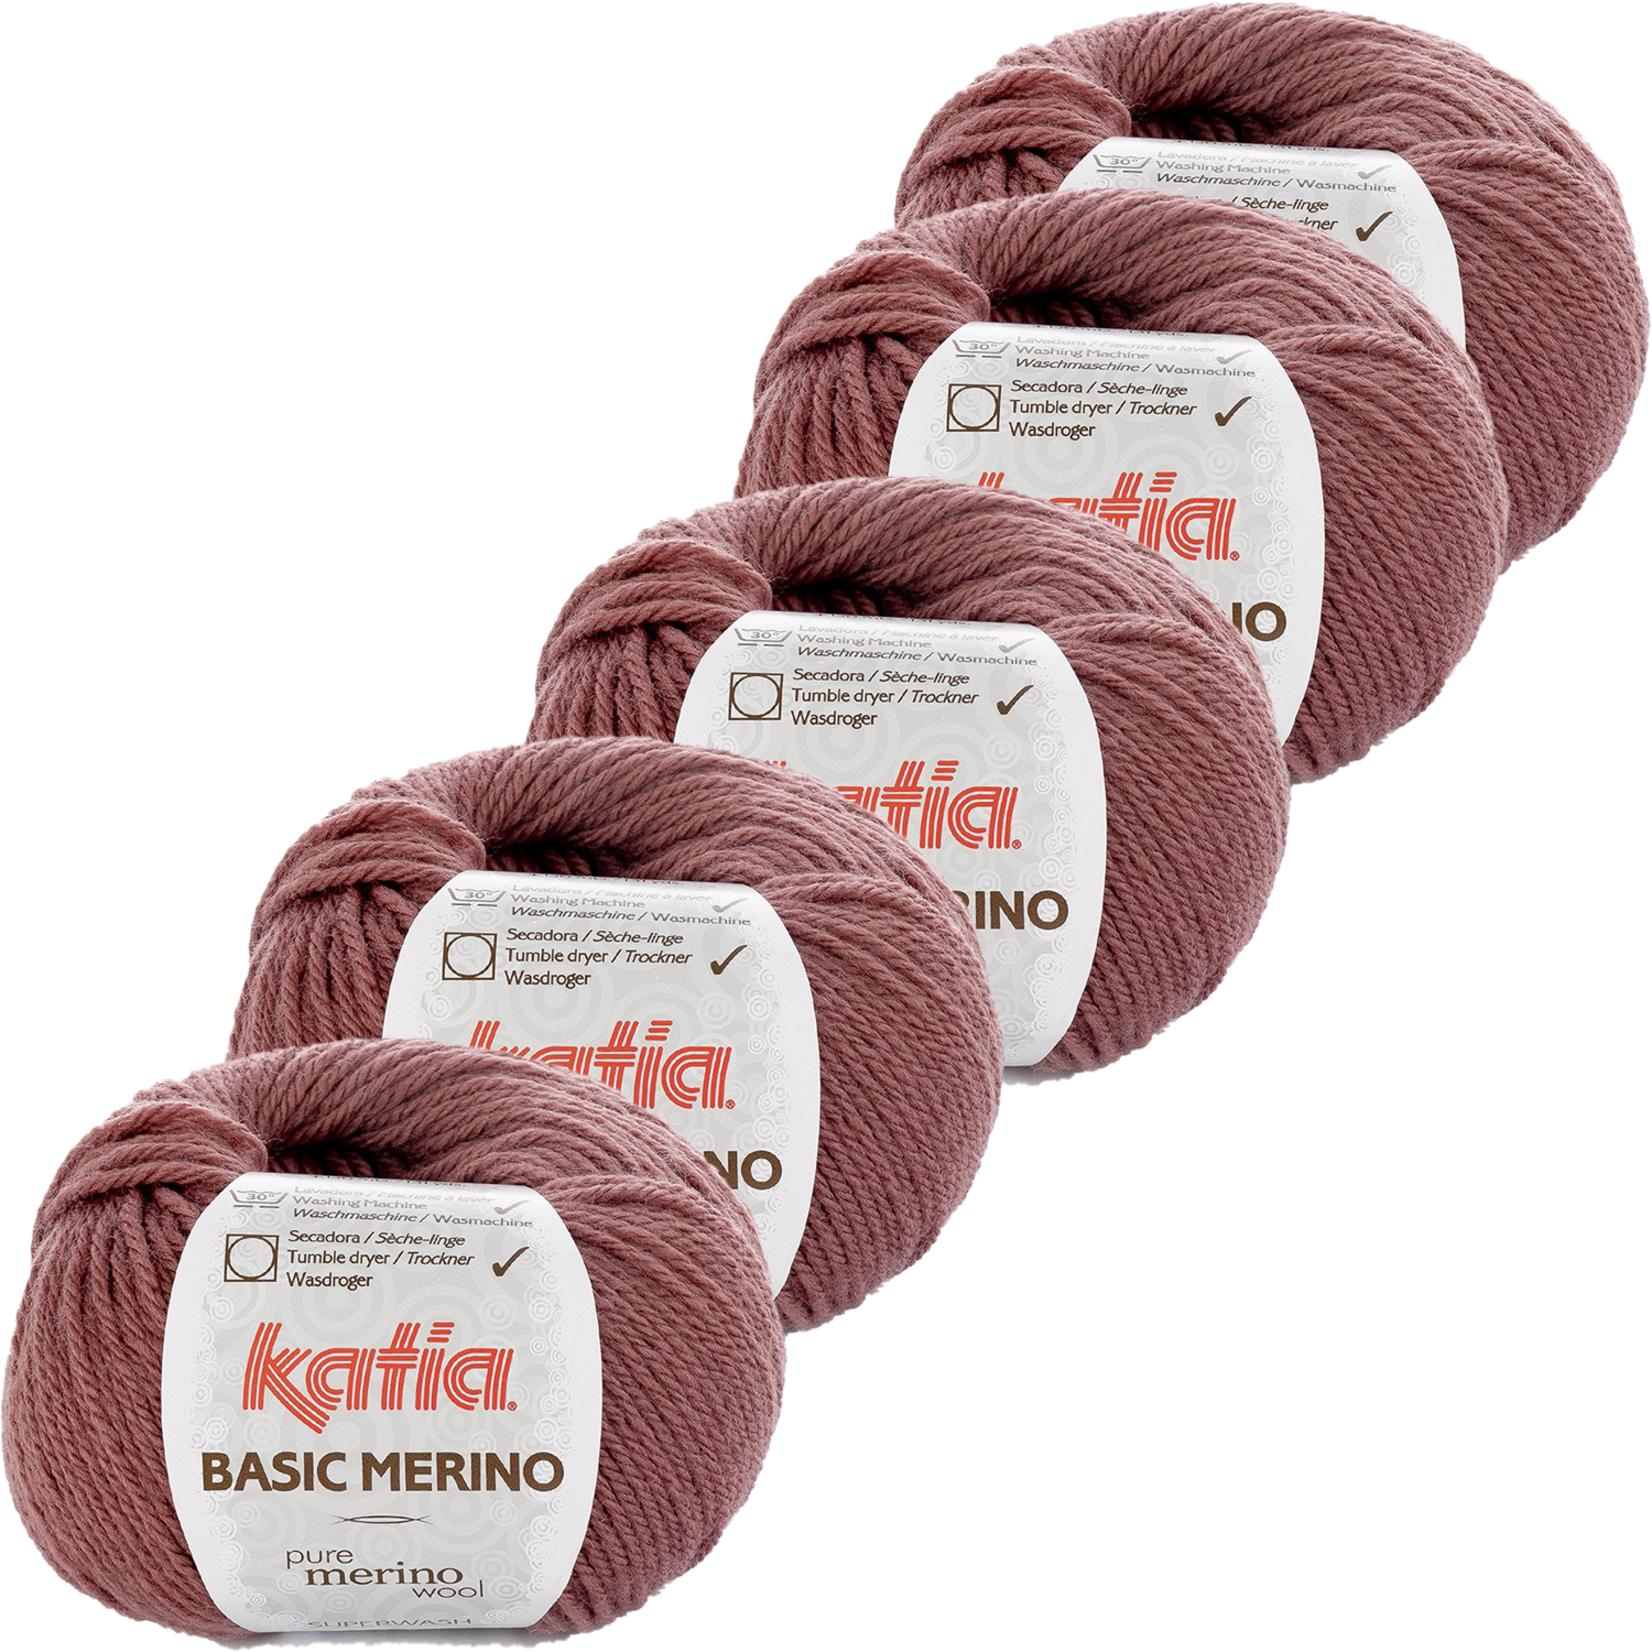 Katia Basic Merino - kleur 74_Donker bleekrood - bundel 5 bollen 50 gr.  van 120 m.